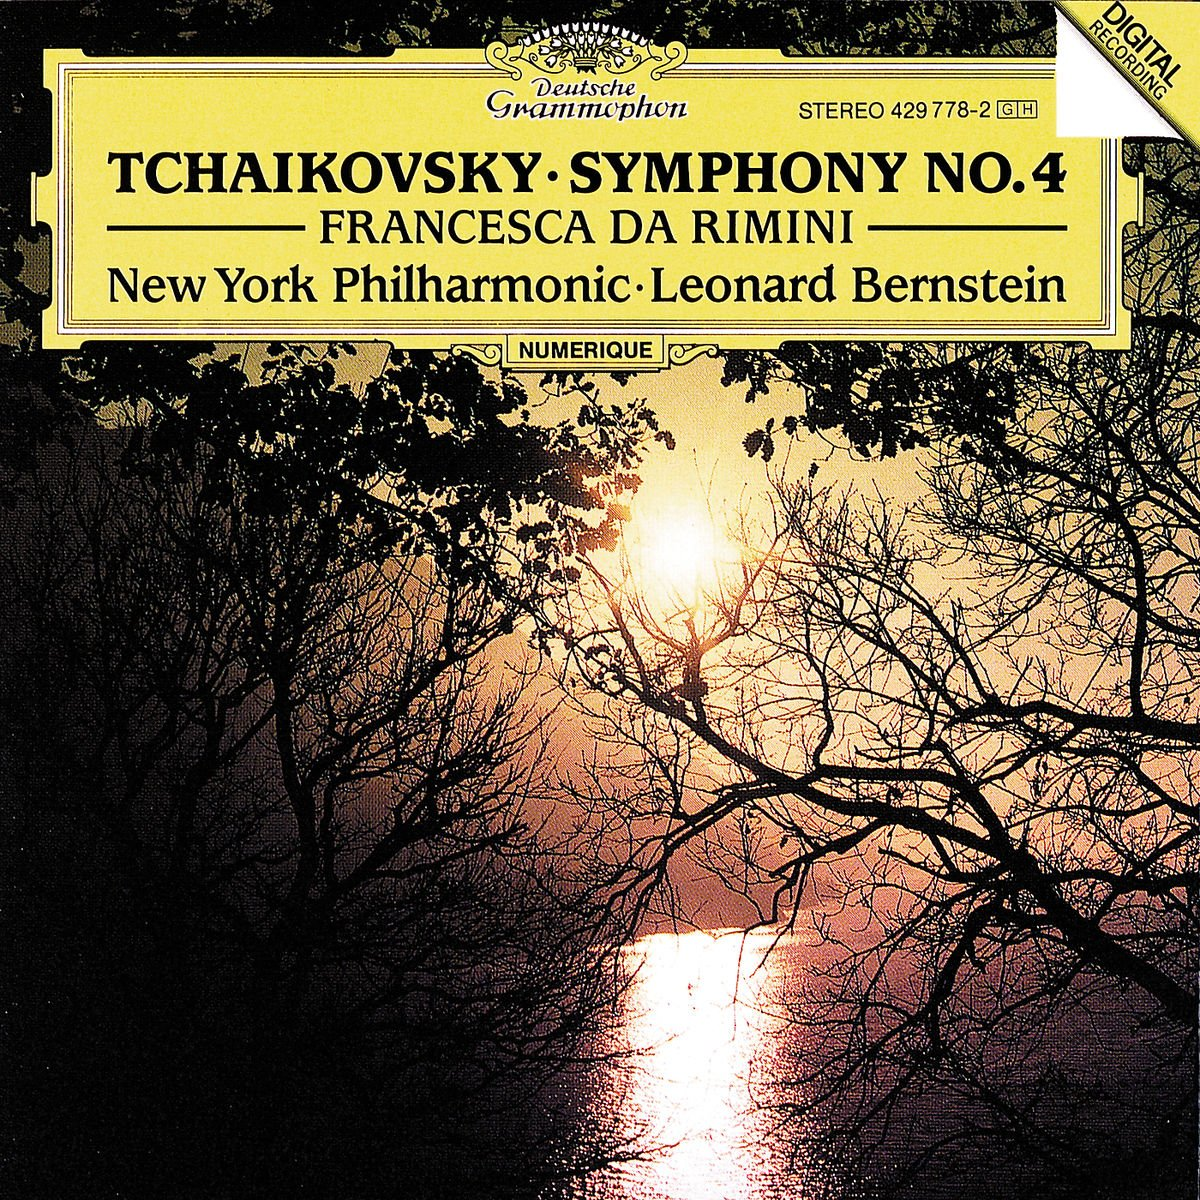 Tchaikovsky: Symphony No. 4 / Francesca da Rimini by Deutsche Grammophon